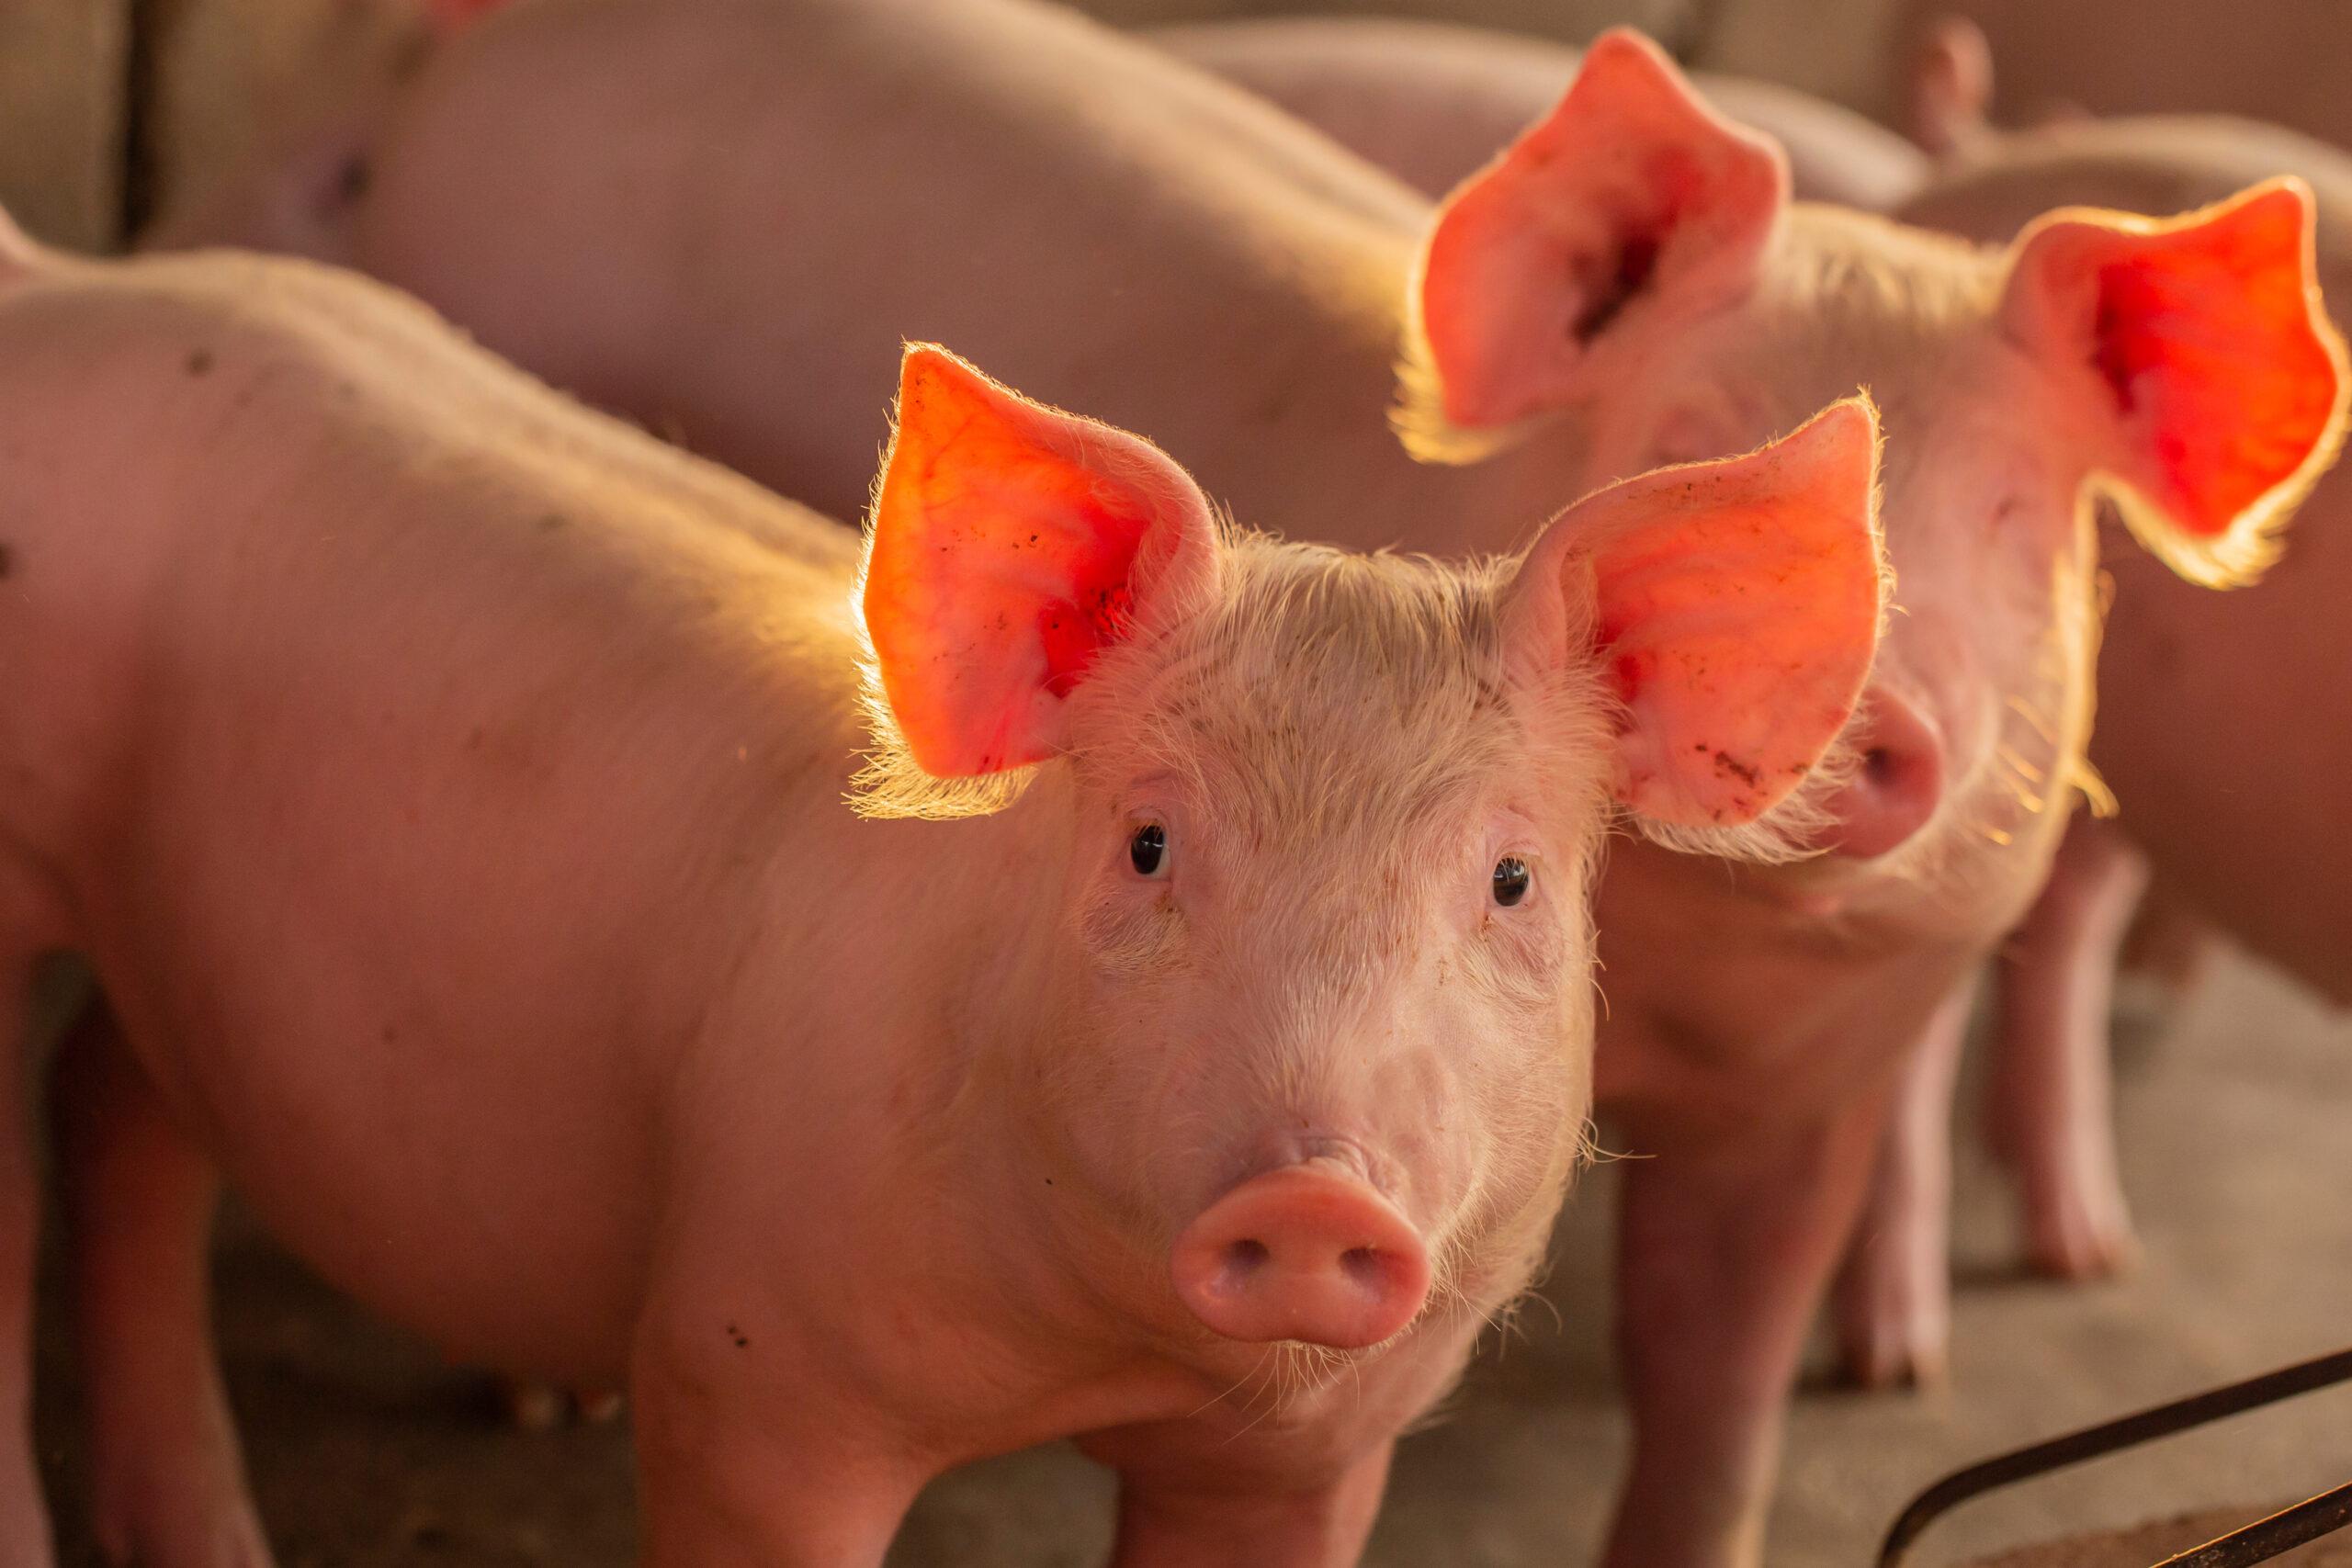 SWINE PIGS PIGLETS SUSTAINABLE AMR